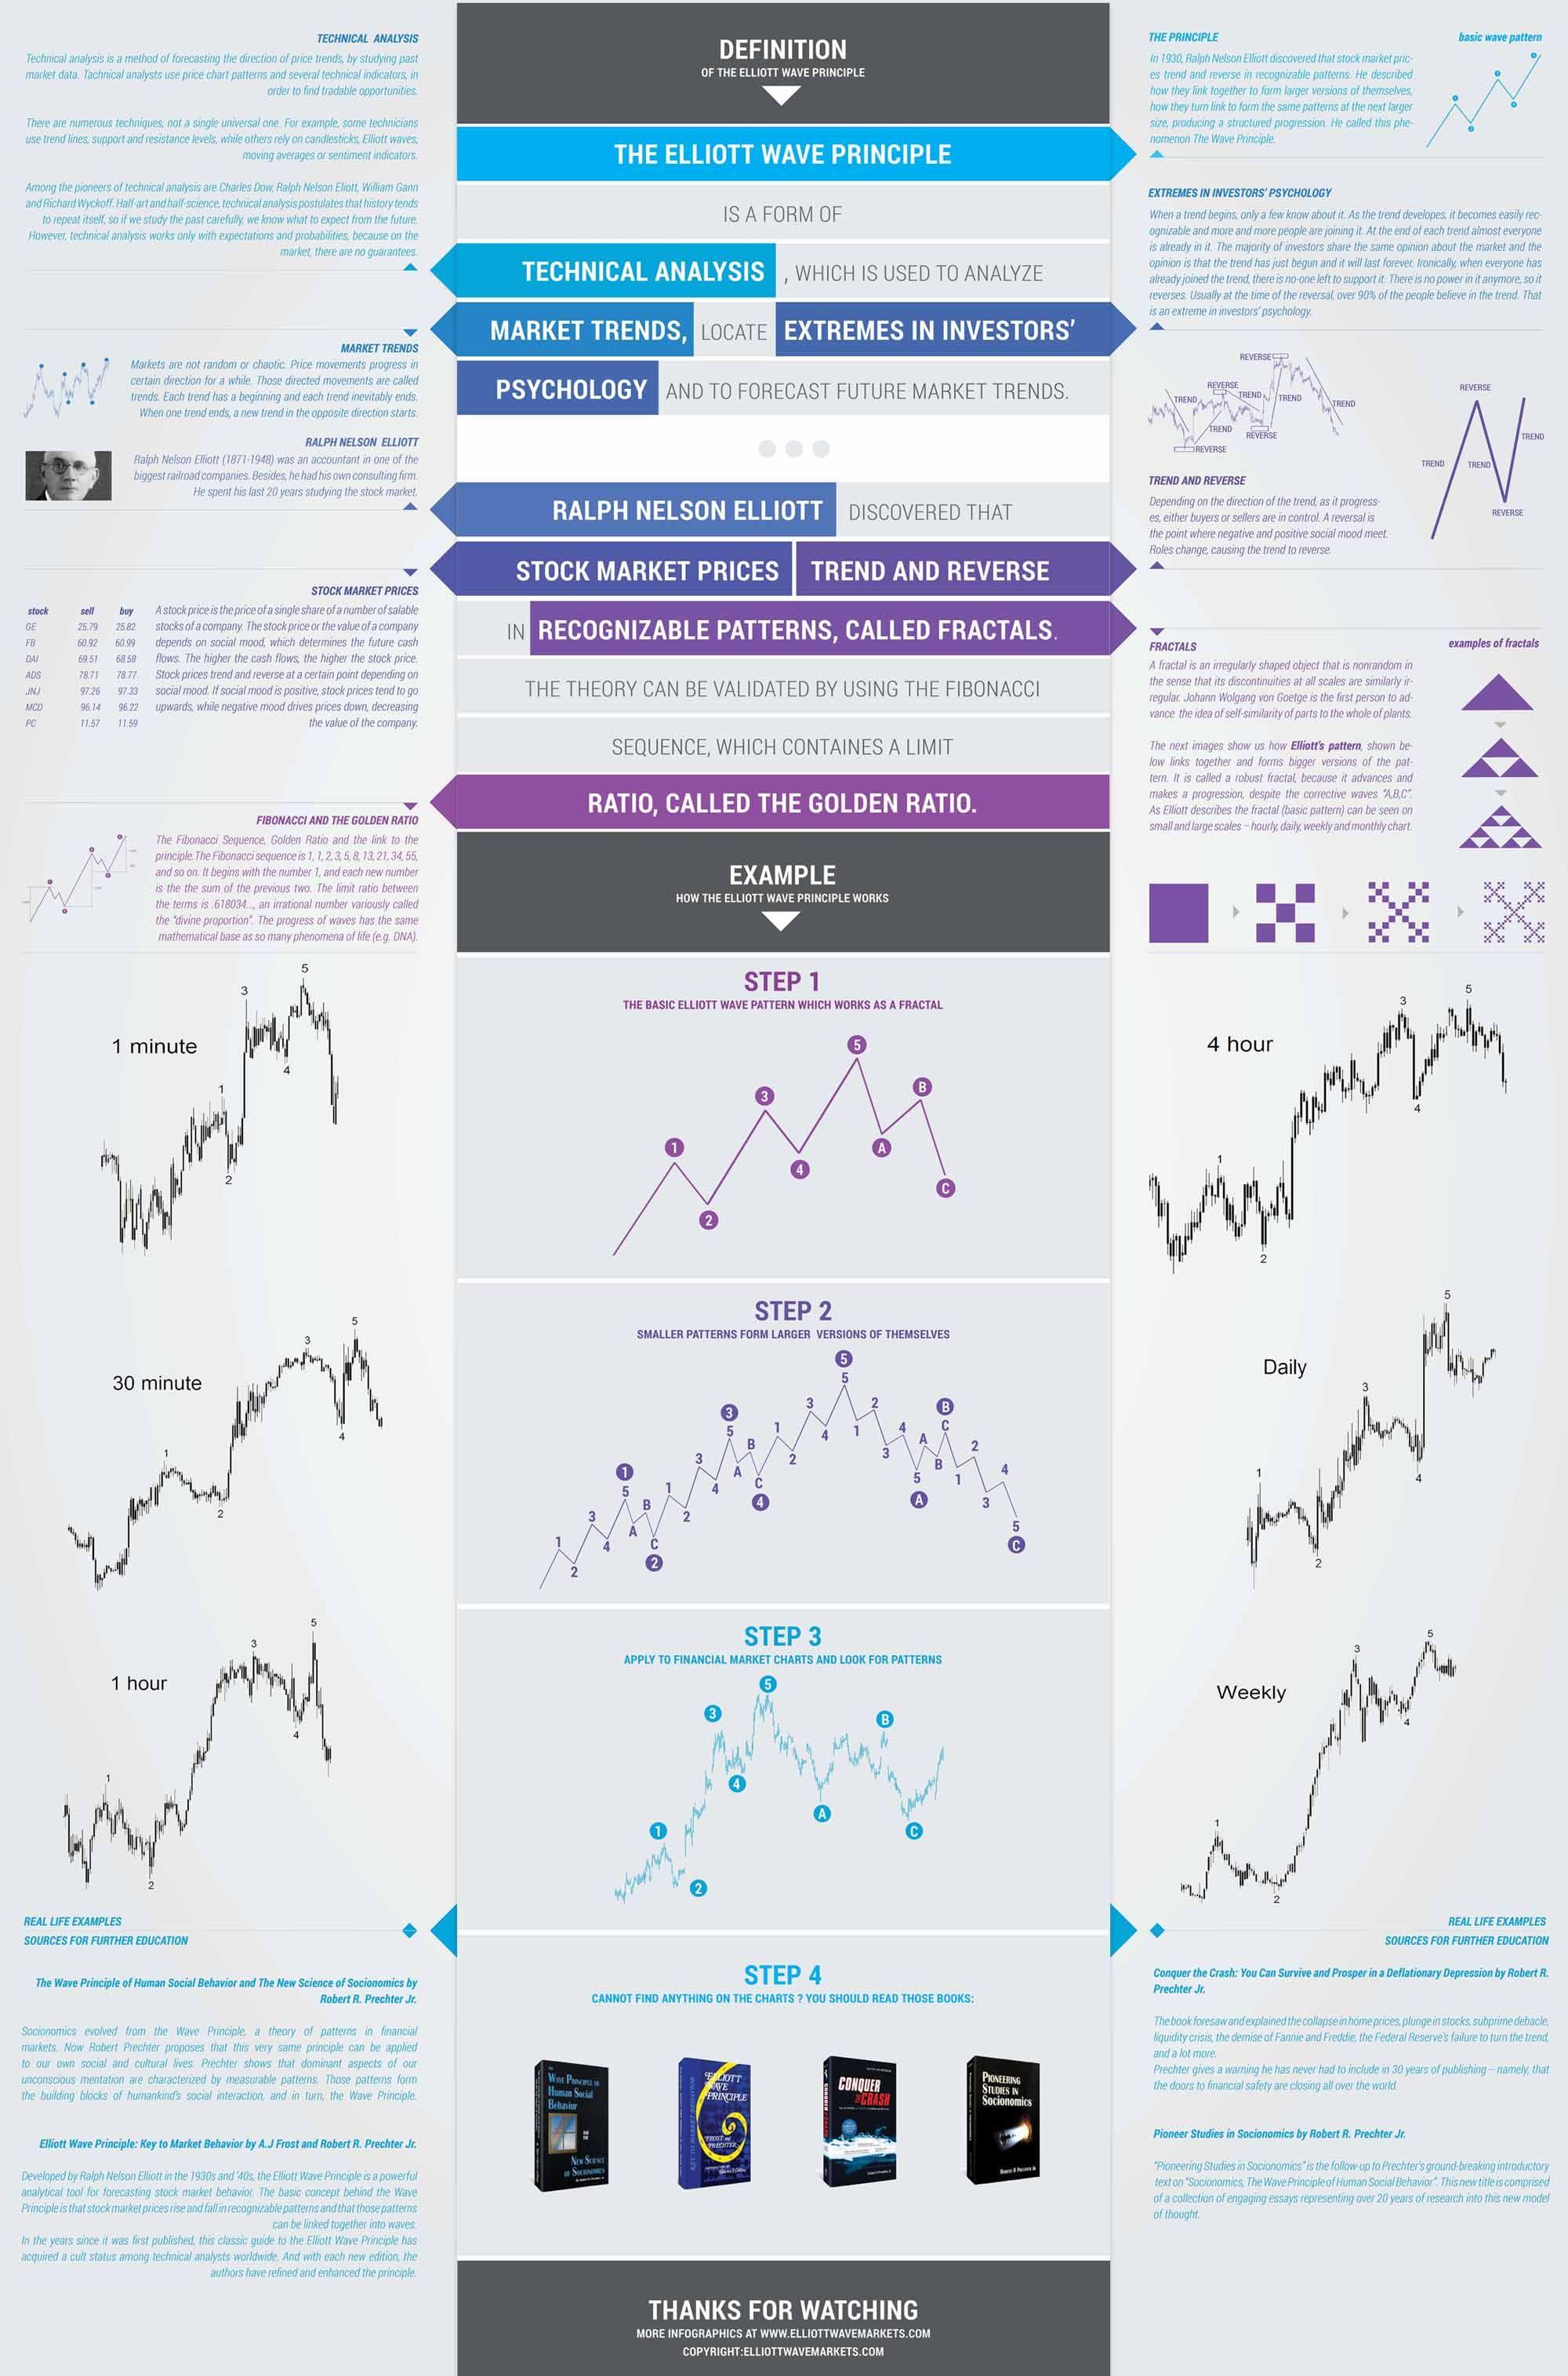 Stock Chart Analysis Technical Analysis Stock Market Wave Theory